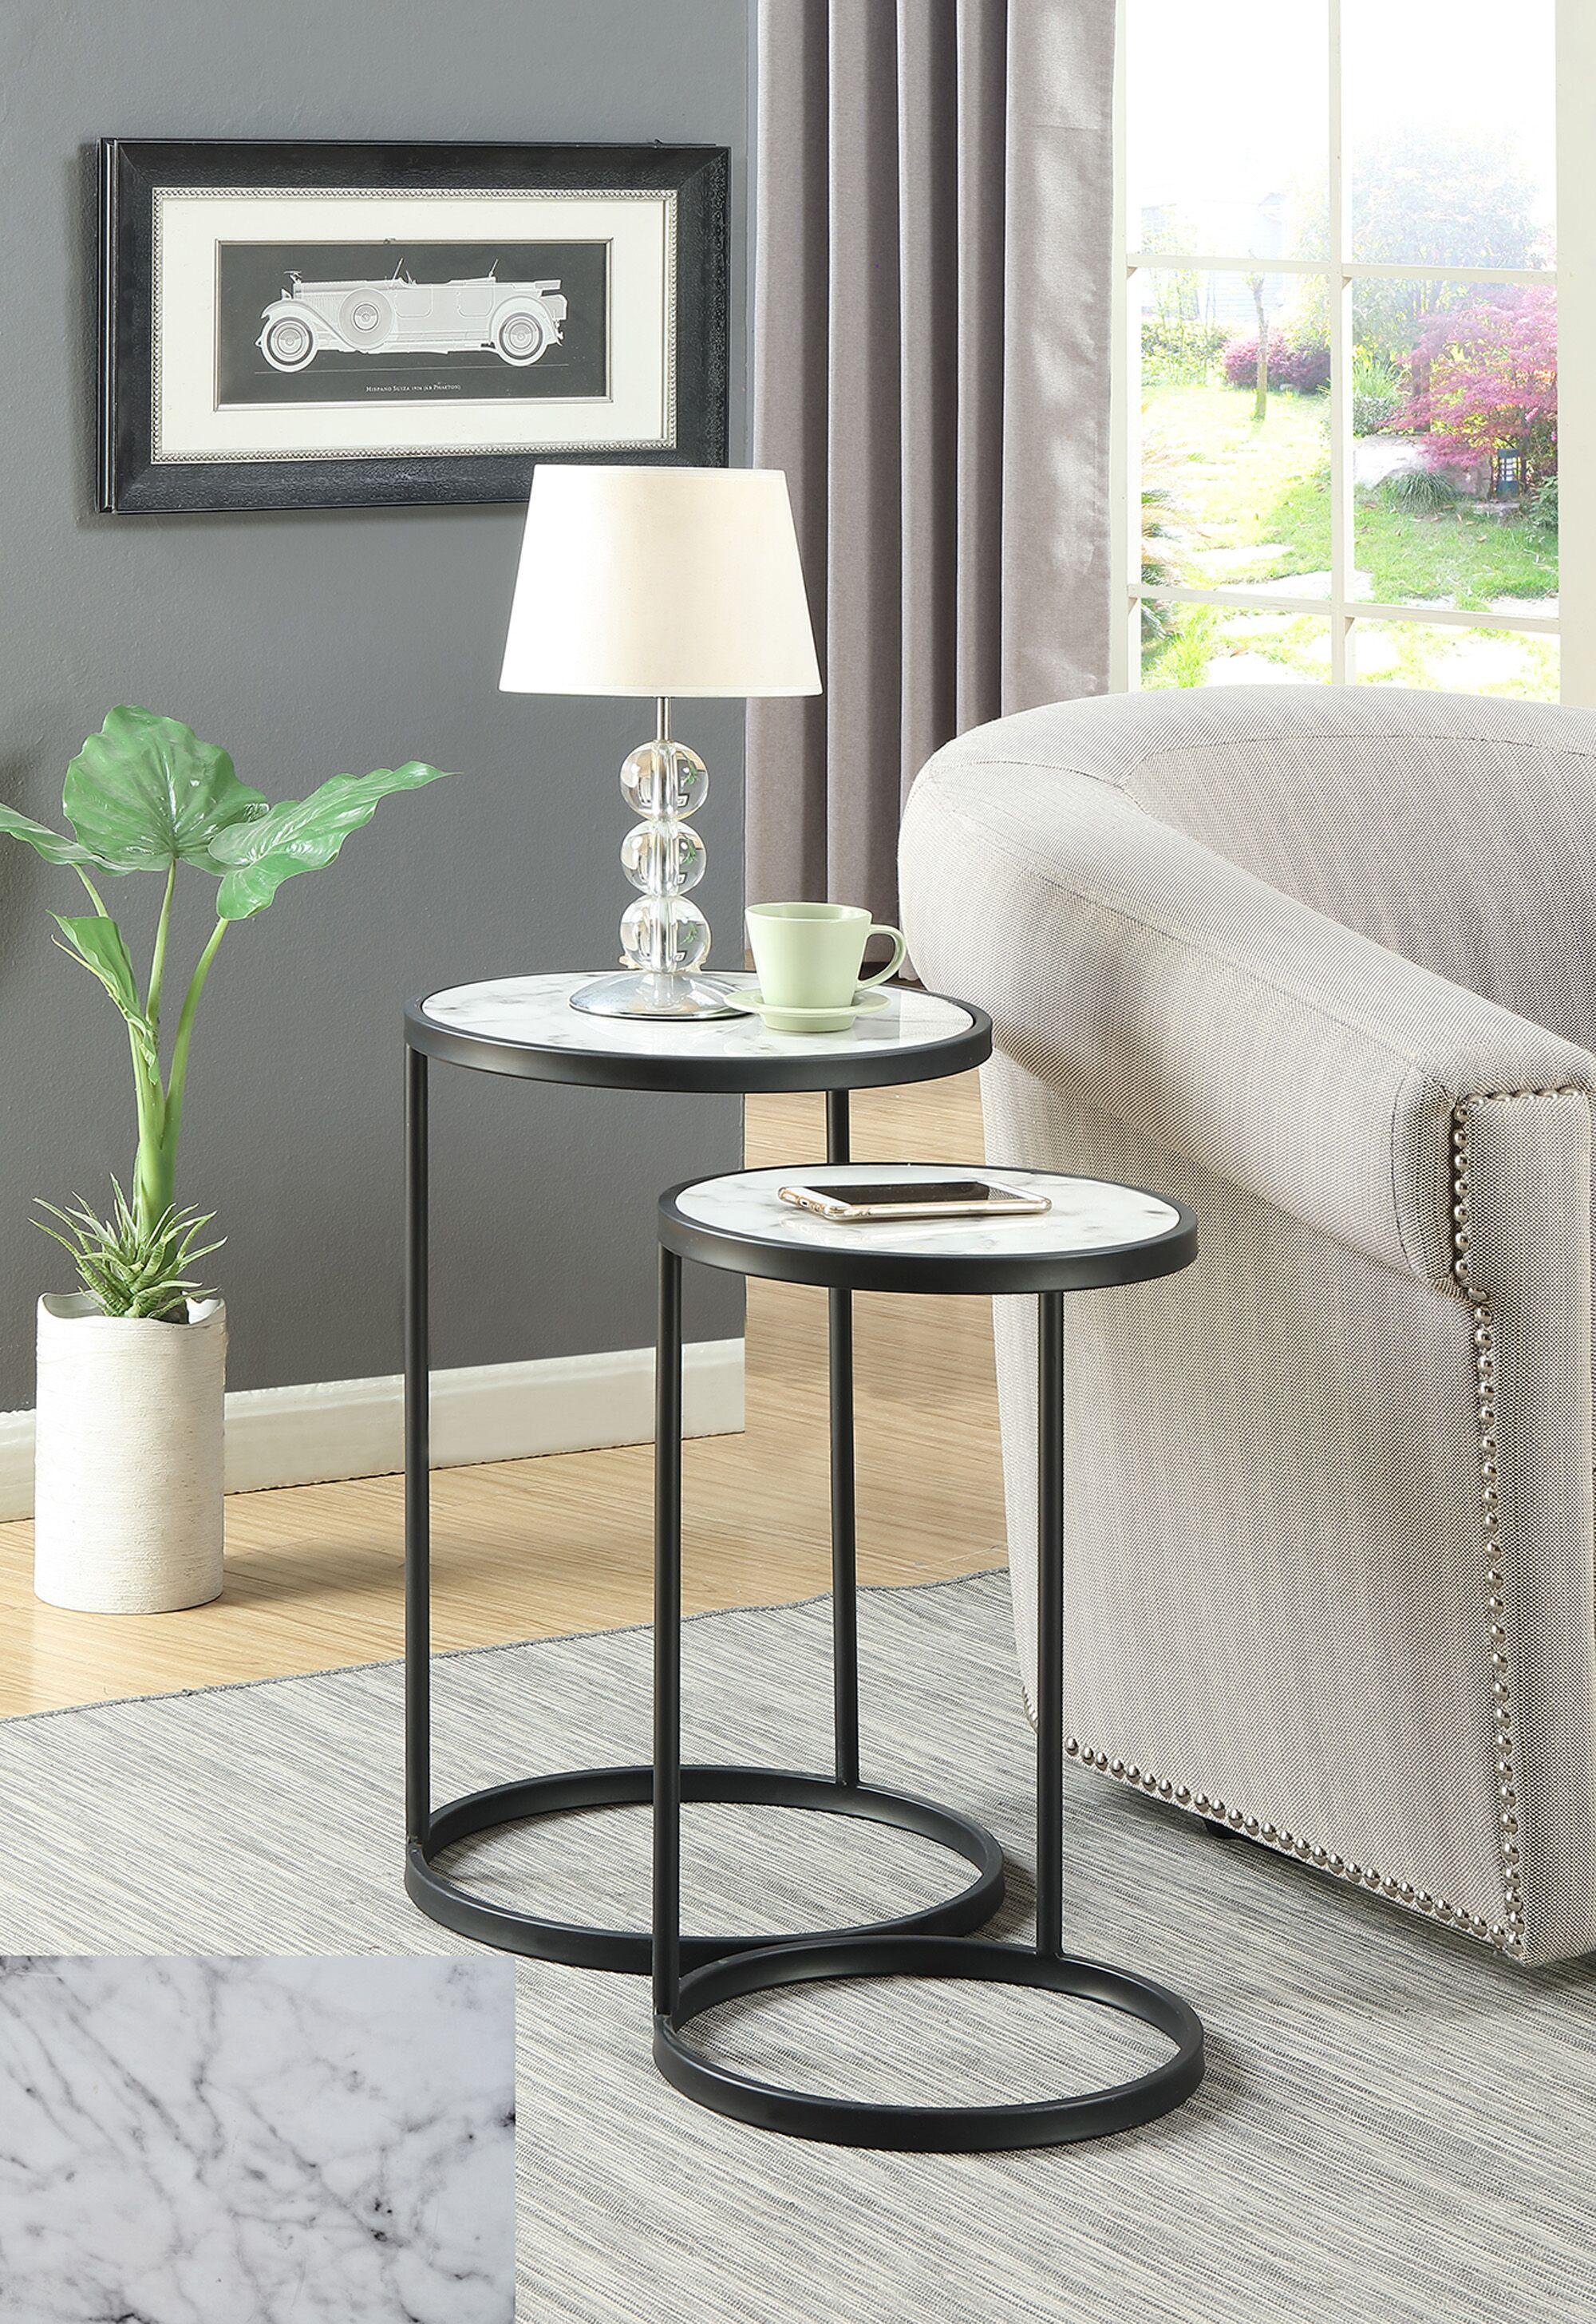 Claybrooks Nesting Tables Color: Black